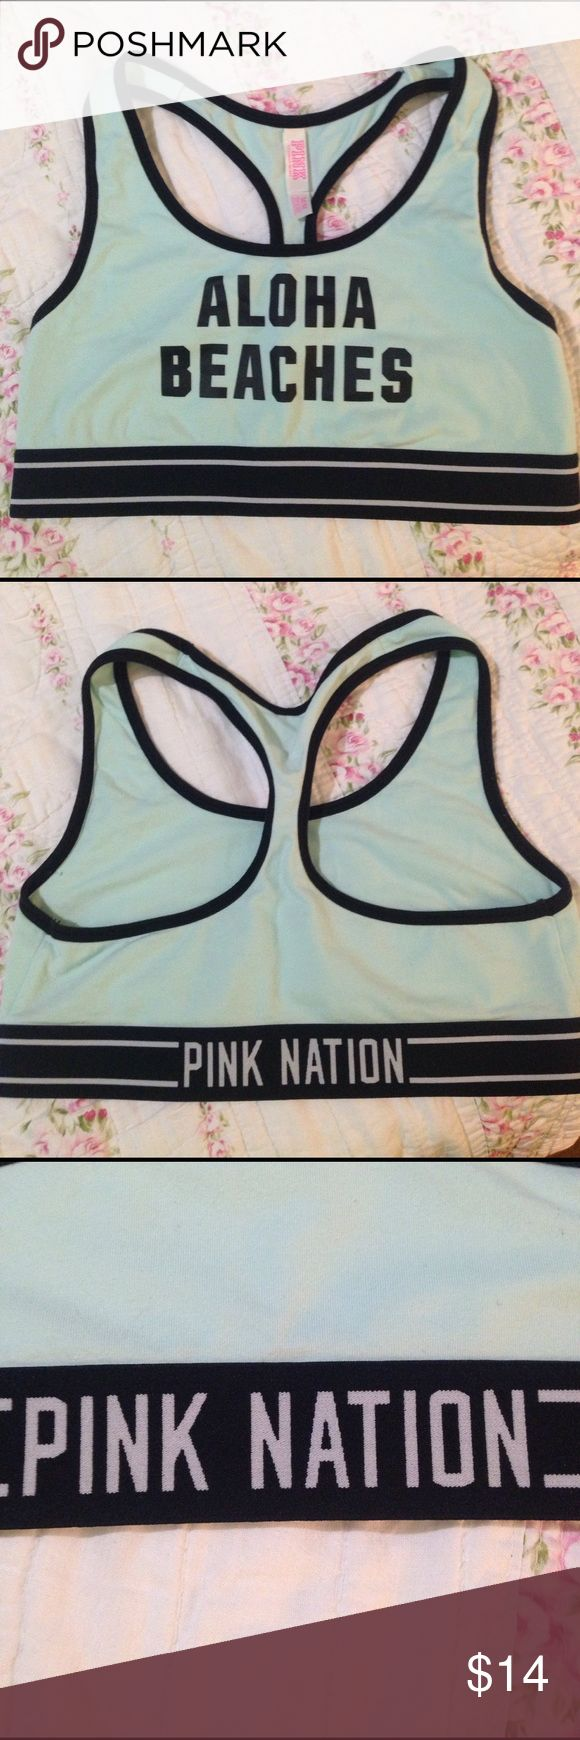 "Victoria Secret PINK racer back bra PINK ""ALOHA BEACHES"" mint green racer back bra. Limited edition. Size Medium. In new condition PINK Victoria's Secret Intimates & Sleepwear Bras"